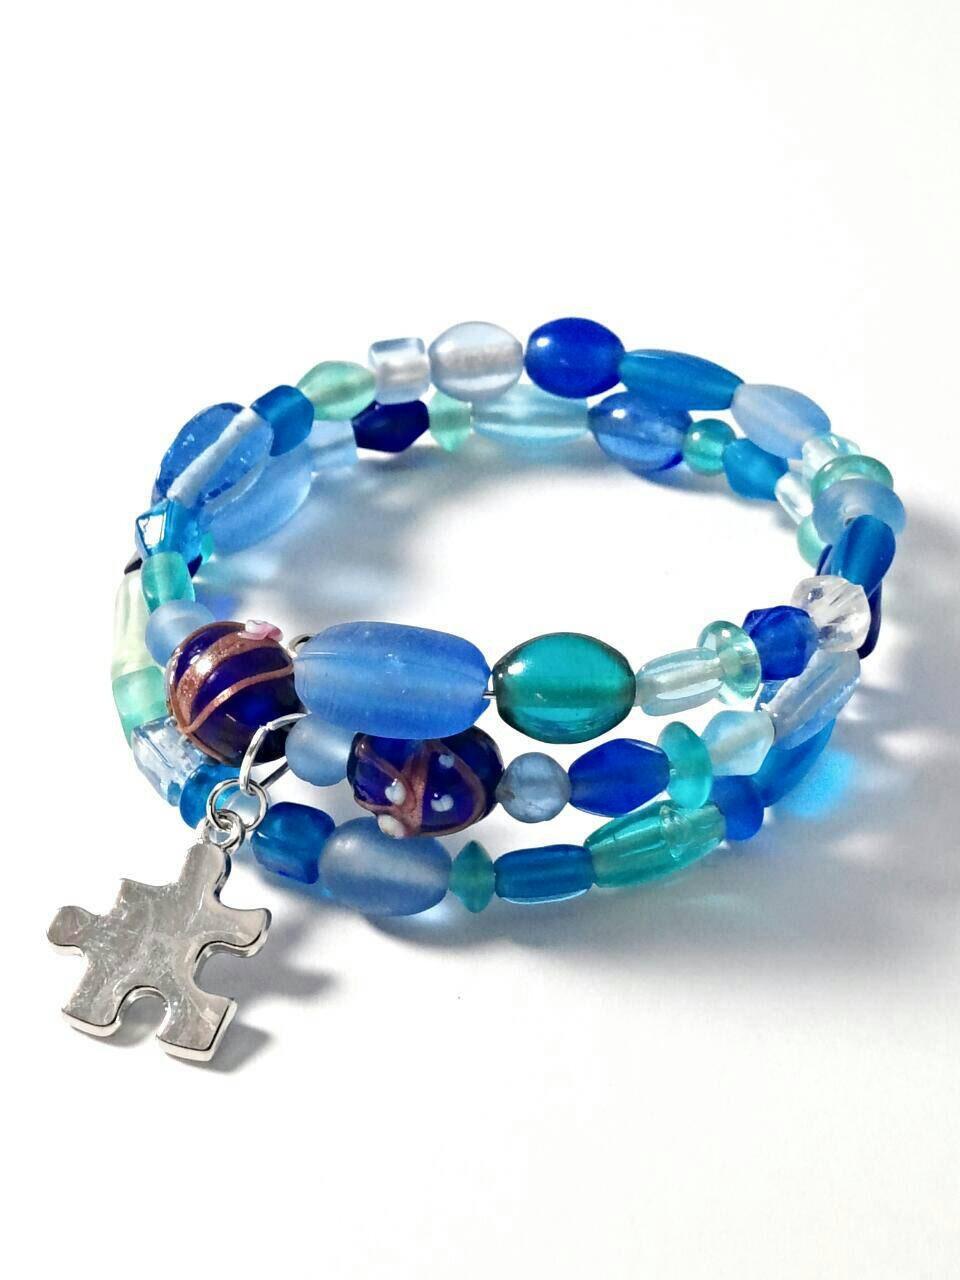 Autism Bracelet Autism Awareness Jewelry Puzzle By Genevassky. Glitter Stud Earrings. Lung Cancer Bracelet. Ametrine Pendant. Flame Pendant. Fat Rings. 100 Carat Diamond. Kwiat Engagement Rings. Pendulum Pendant